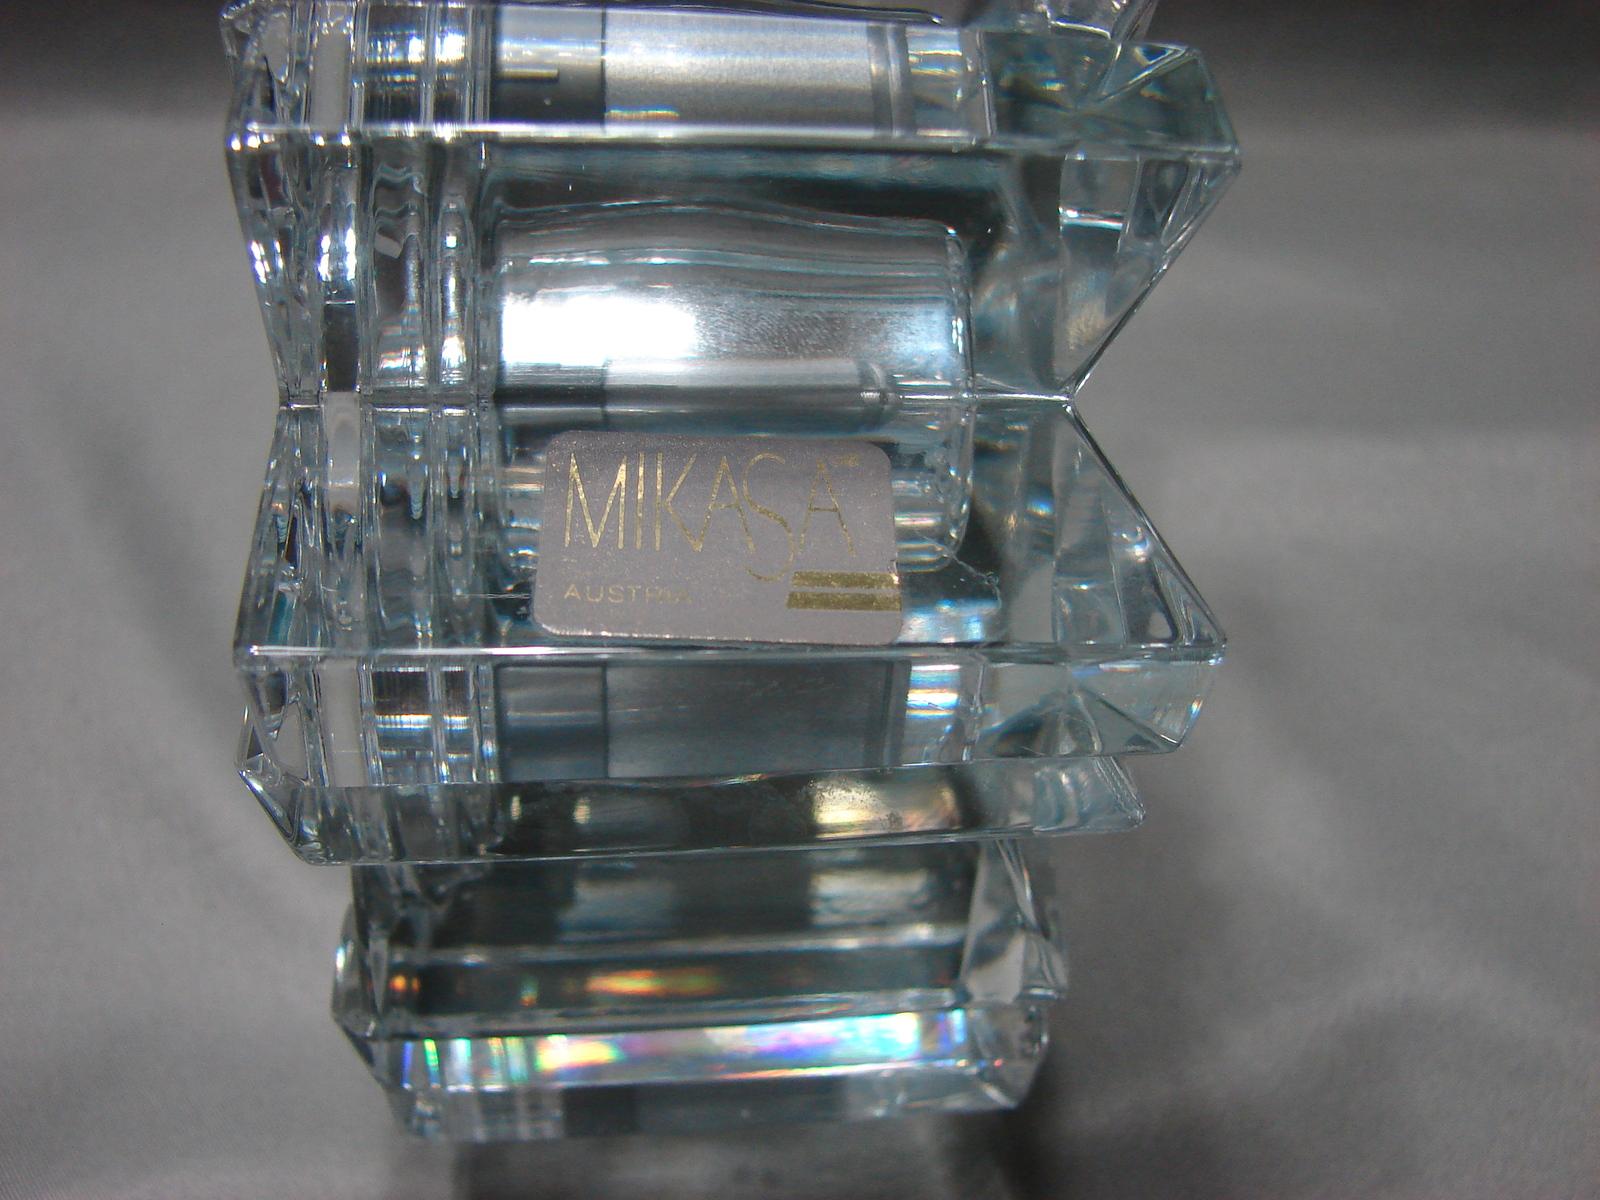 Mikasa Austria StarFire Crystal Clear Glass Star Quartz Round Clock Germany Made image 5